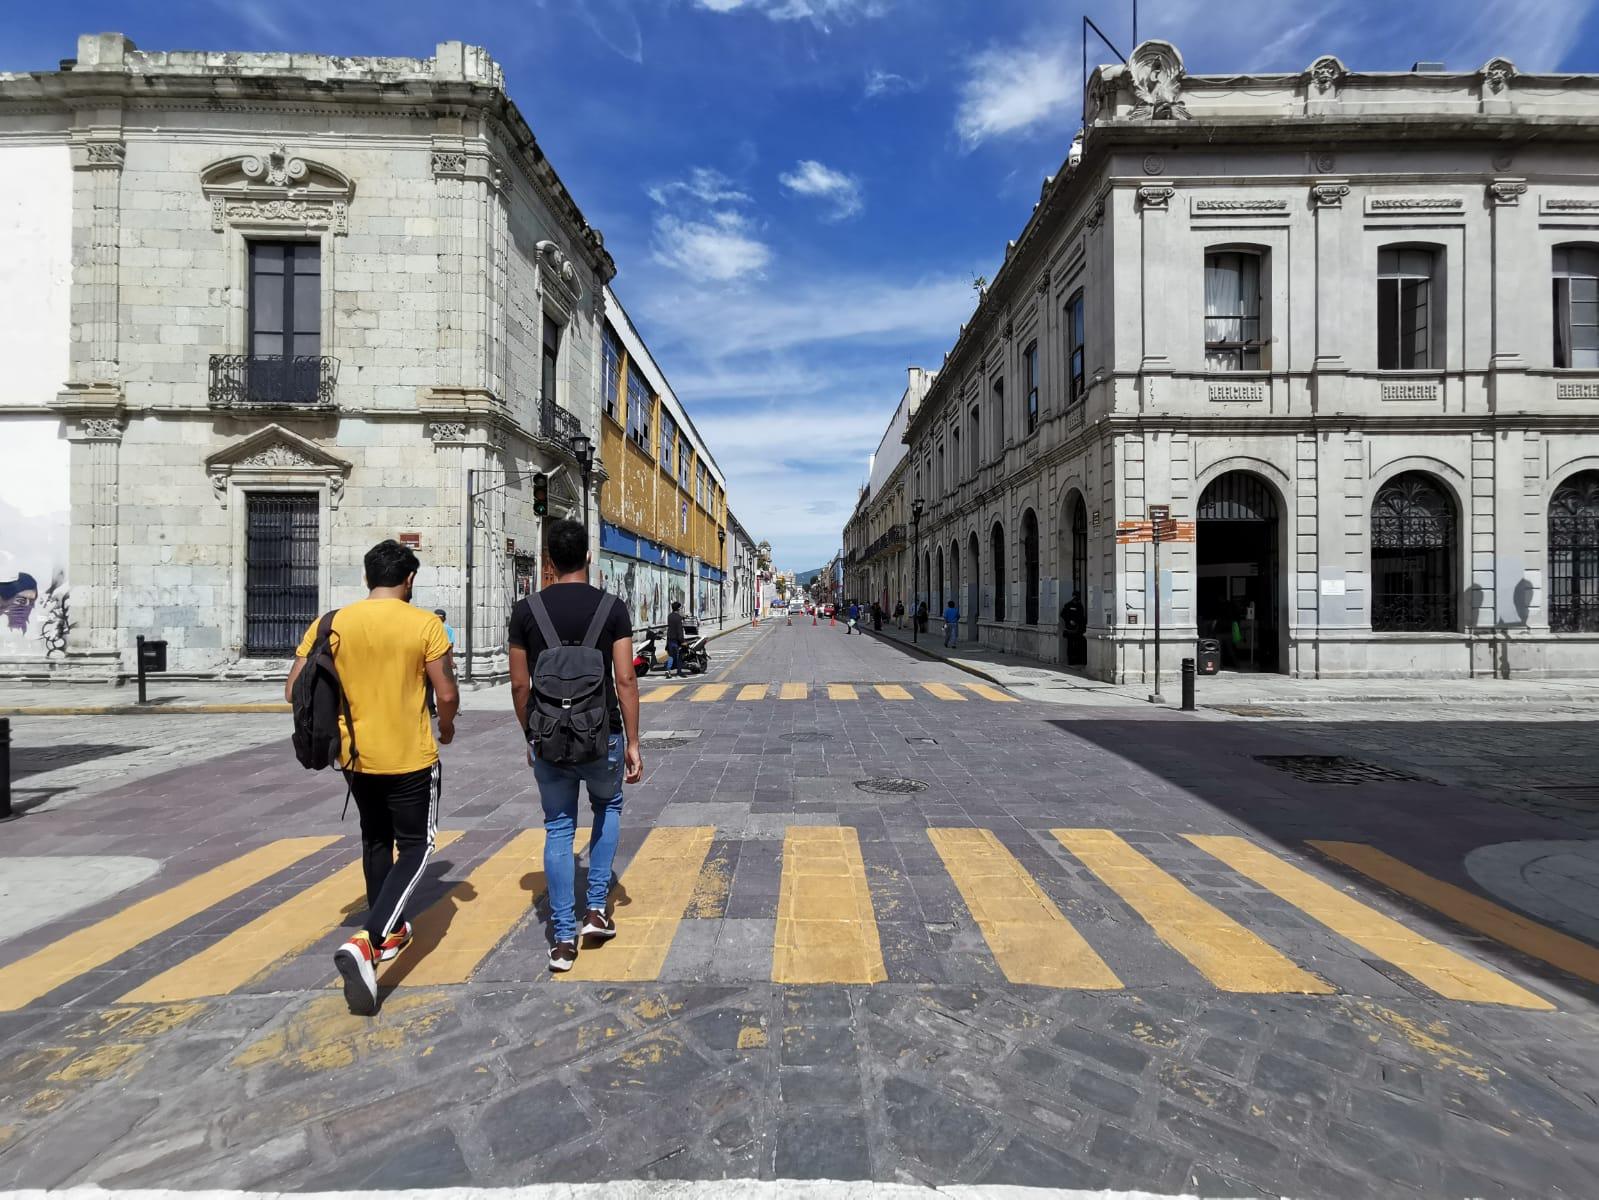 Disminuyen ligeramente casos activos y ocupación hospitalaria por Covid-19 en Oaxaca; continúa semáforo naranja